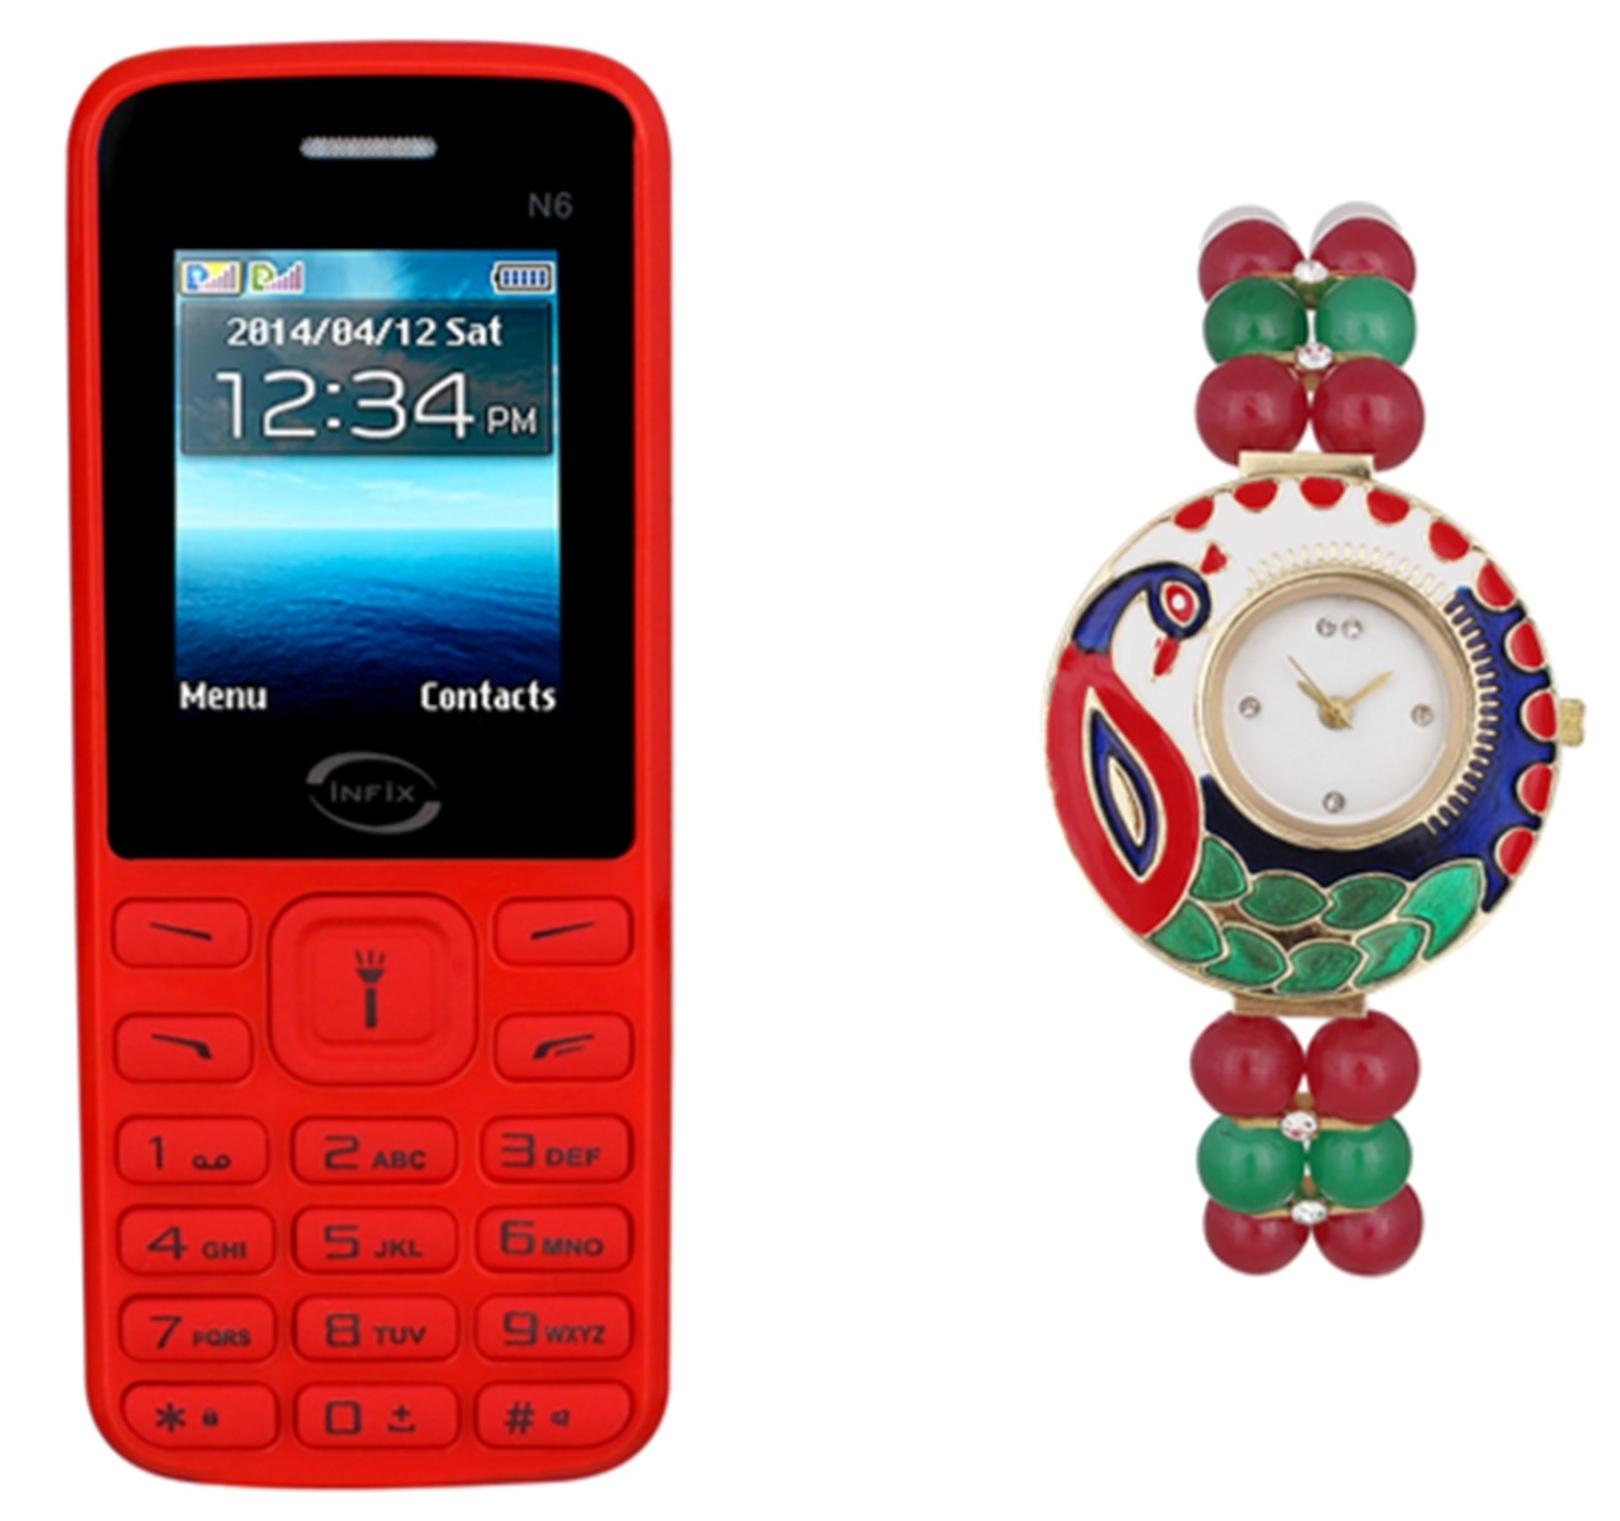 Infix N6(Red)